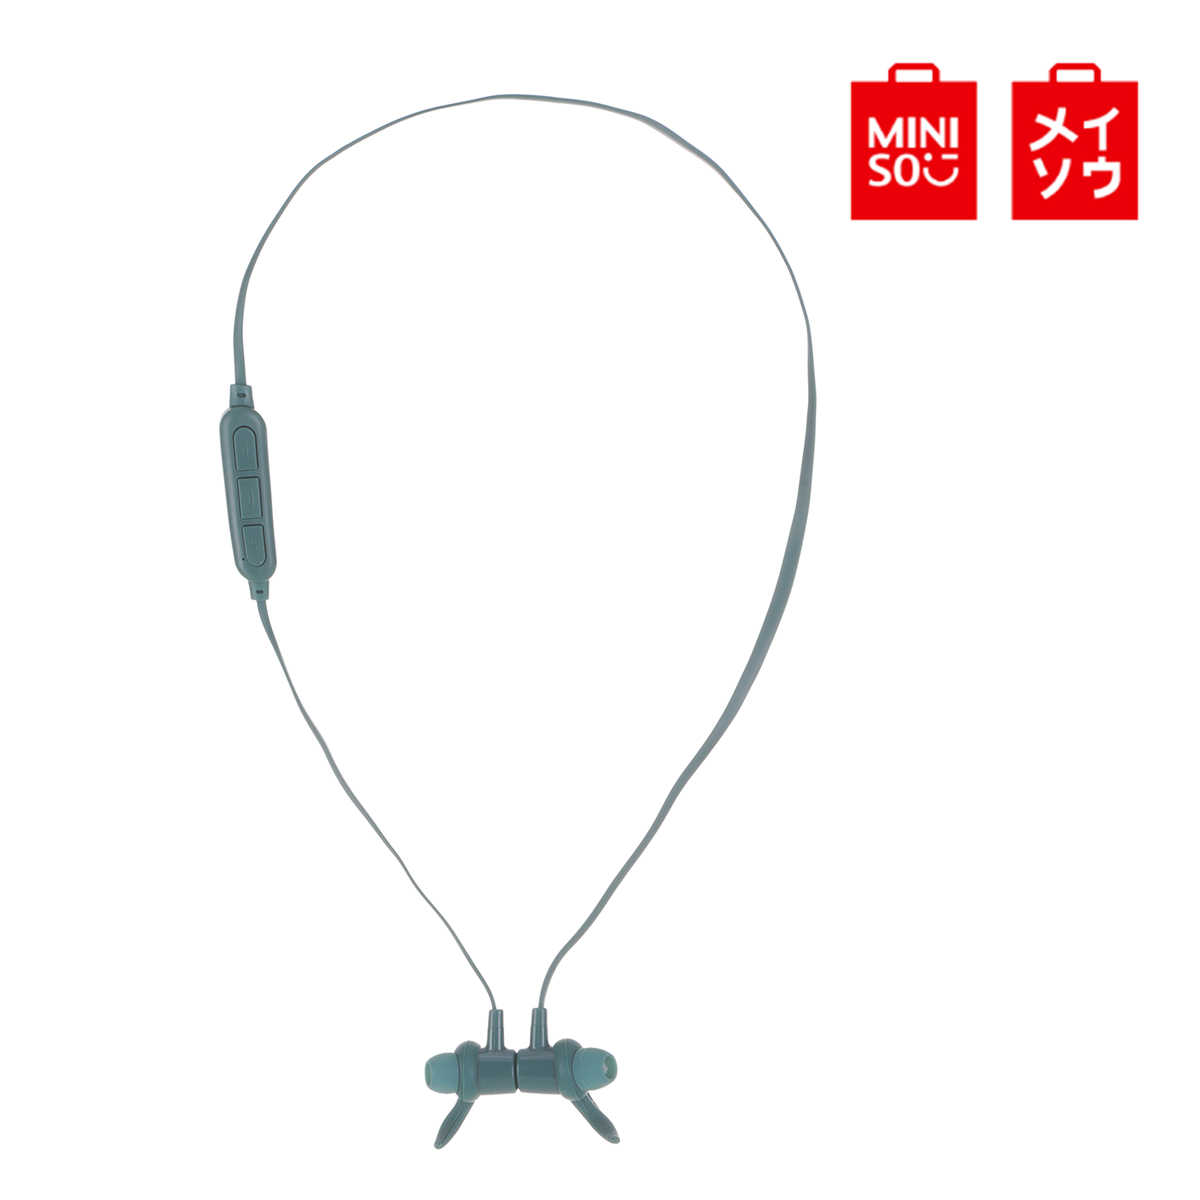 Miniso BT307 Magnetik Nirkabel Headphone Bluetooth Earphone Stereo Earphone Sport Headset Concision Style untuk Ponsel